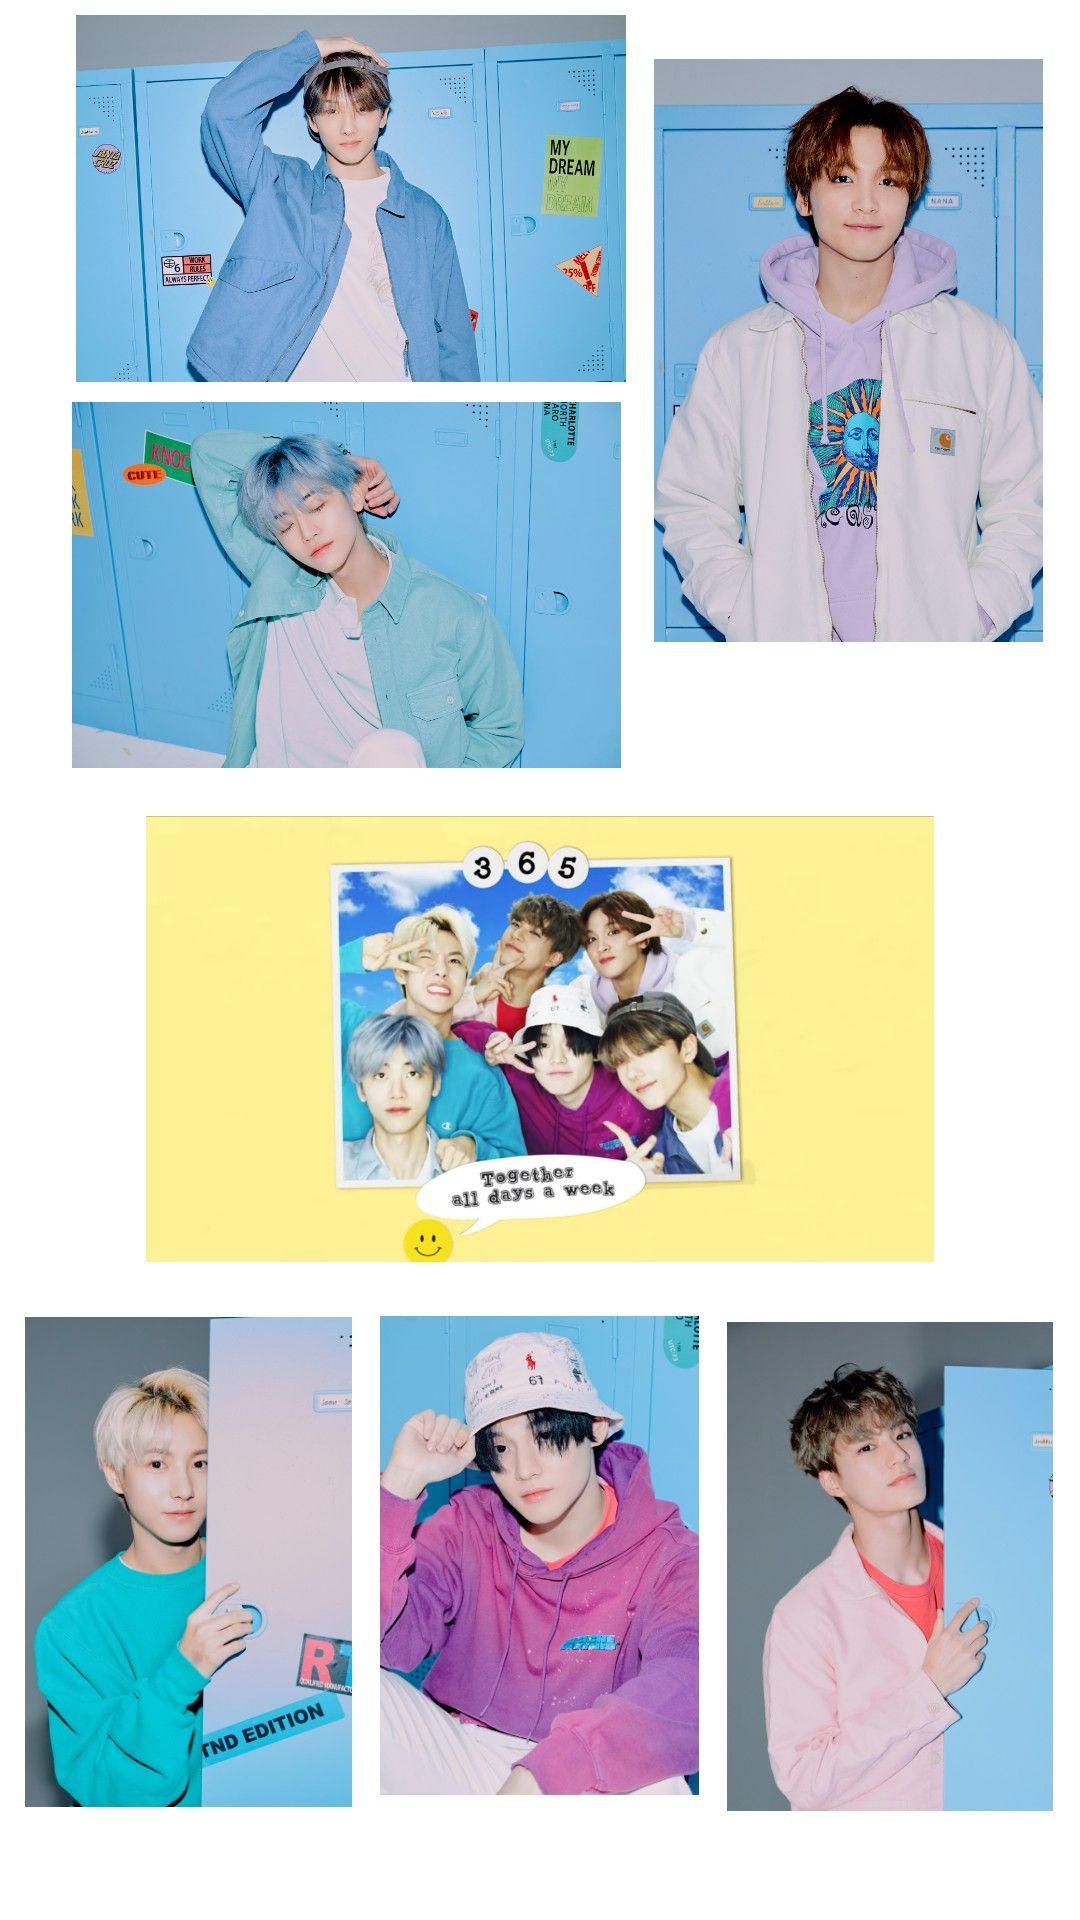 Nct dream reload ridin wallpaper di 2020 Wallpaper lucu Nct 1080x1920